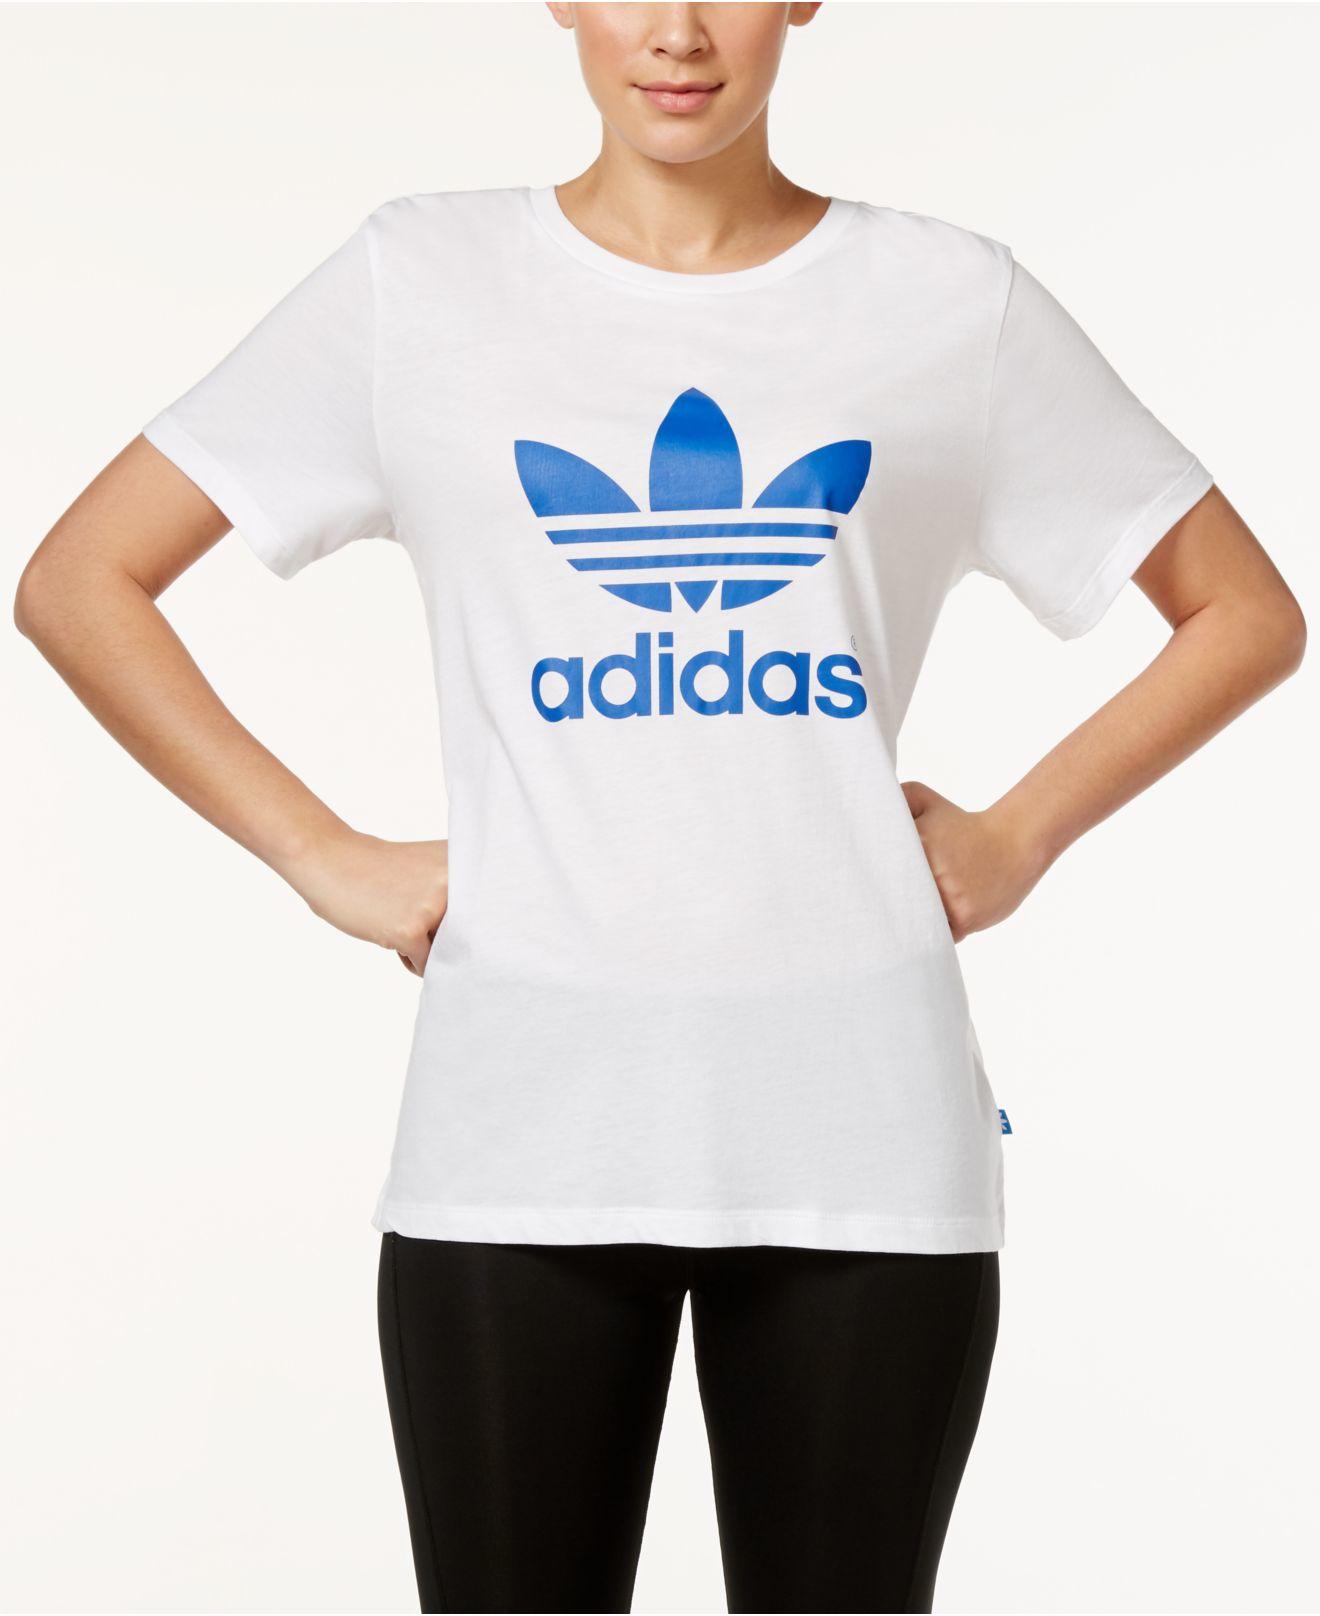 e06647ca8ea Lyst - adidas Originals Boyfriend Trefoil T-shirt in White